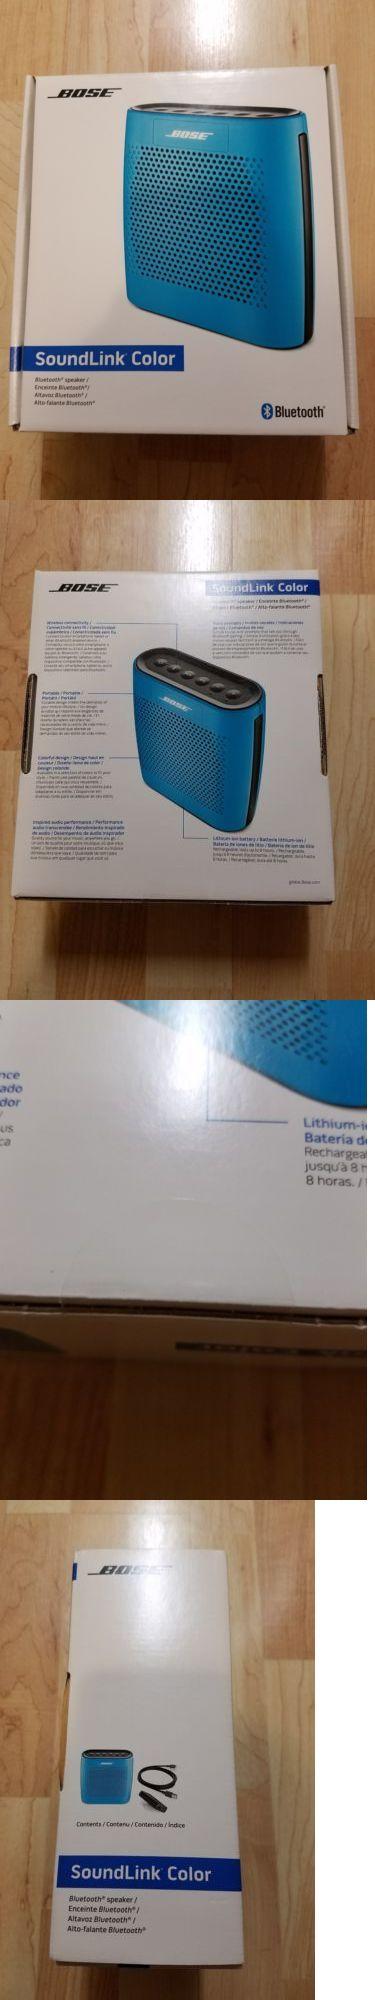 Audio Docks and Mini Speakers: Brand New Bose Soundlink Color Bluetooth Speaker (Blue) Bnib -> BUY IT NOW ONLY: $110 on eBay!